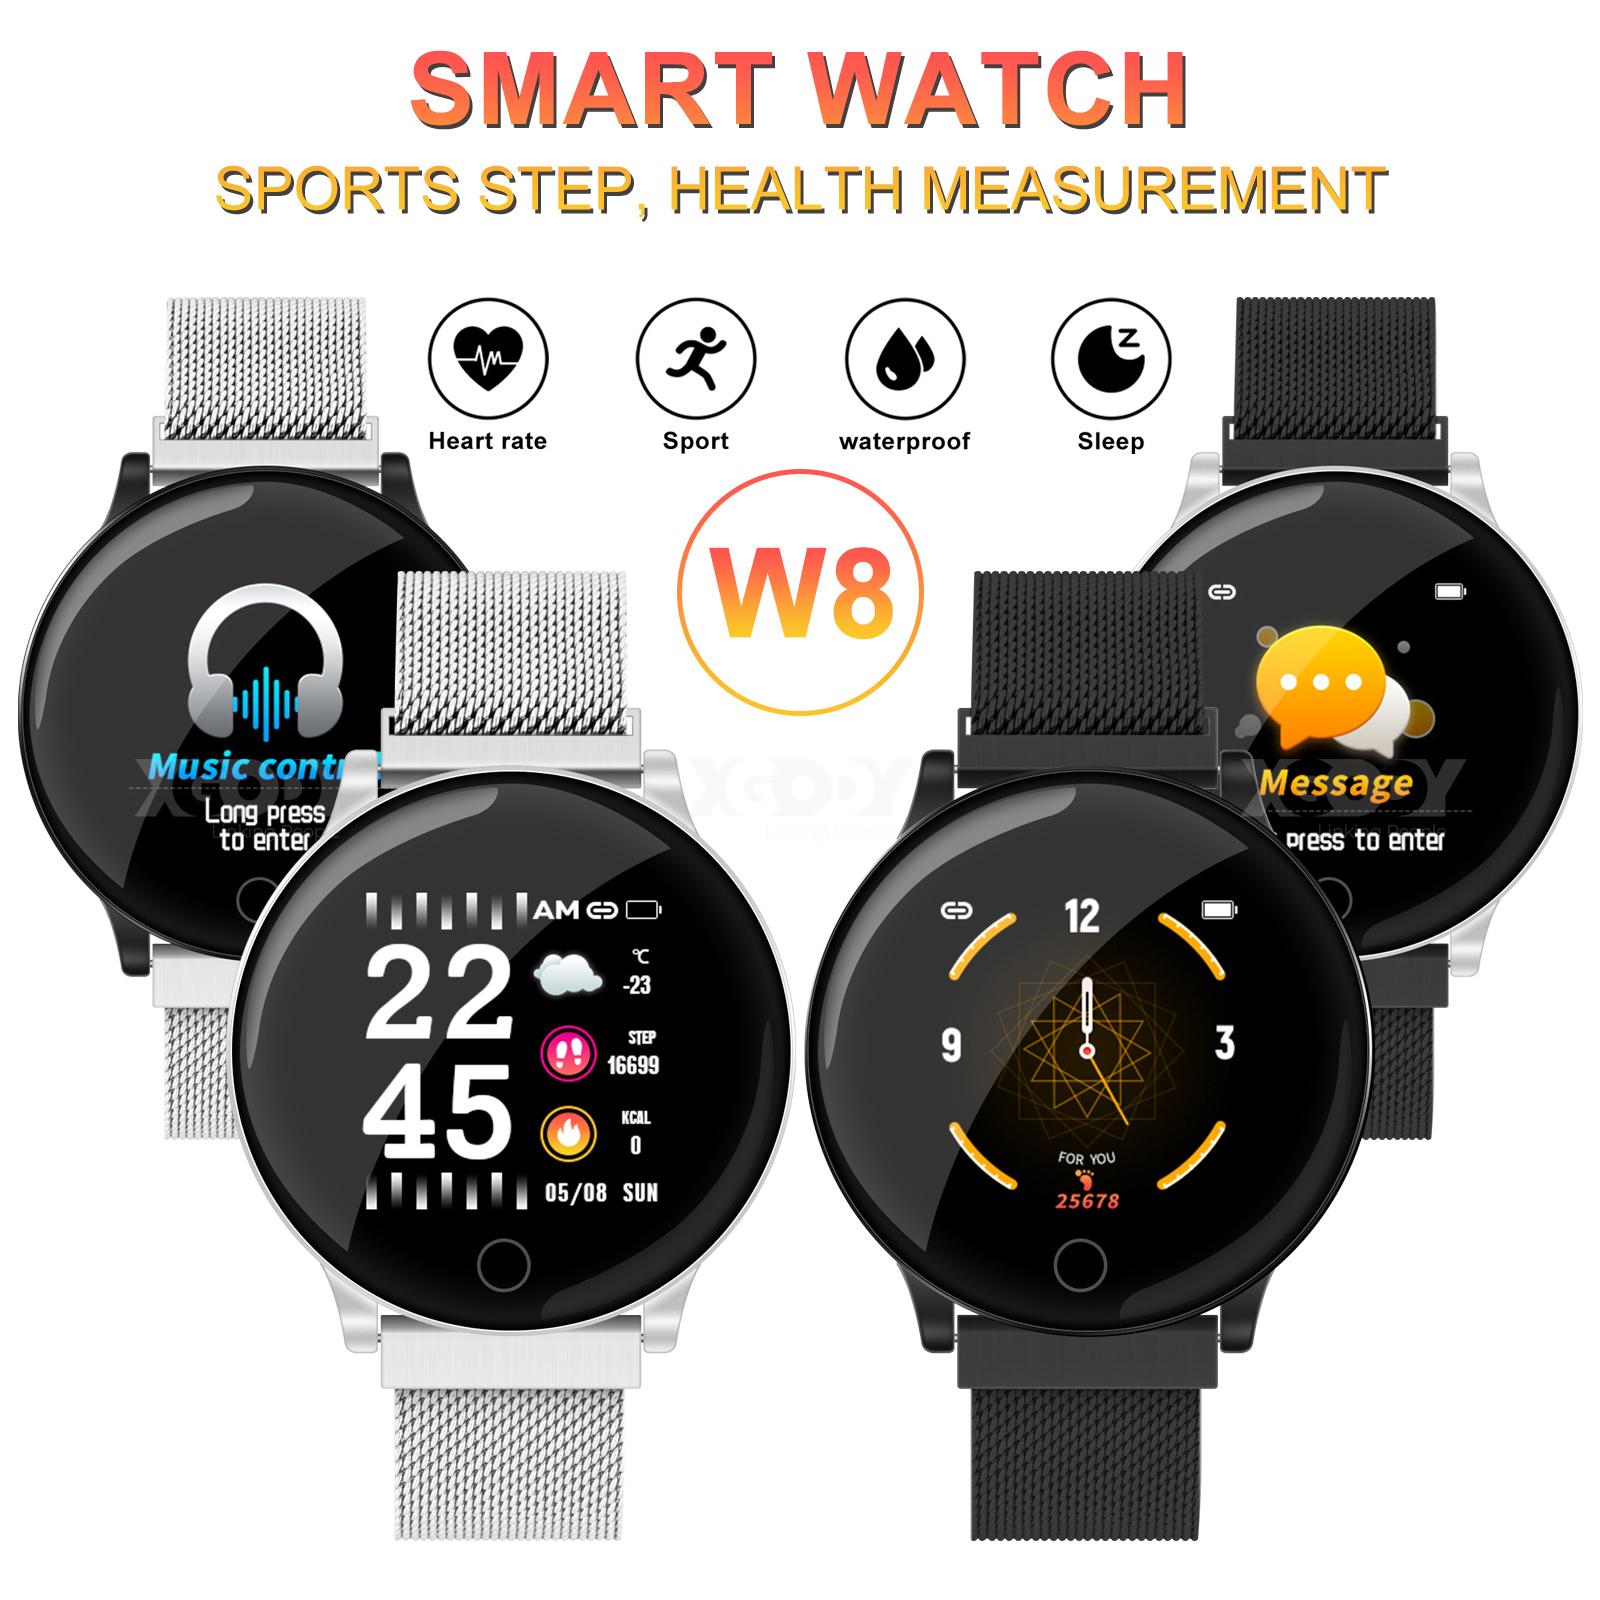 XGODY Fitness Tracker Smart Watch Heart Rate Monitor Blood Pressure Wristband W8 blood fitness heart monitor pressure rate smart tracker watch xgody